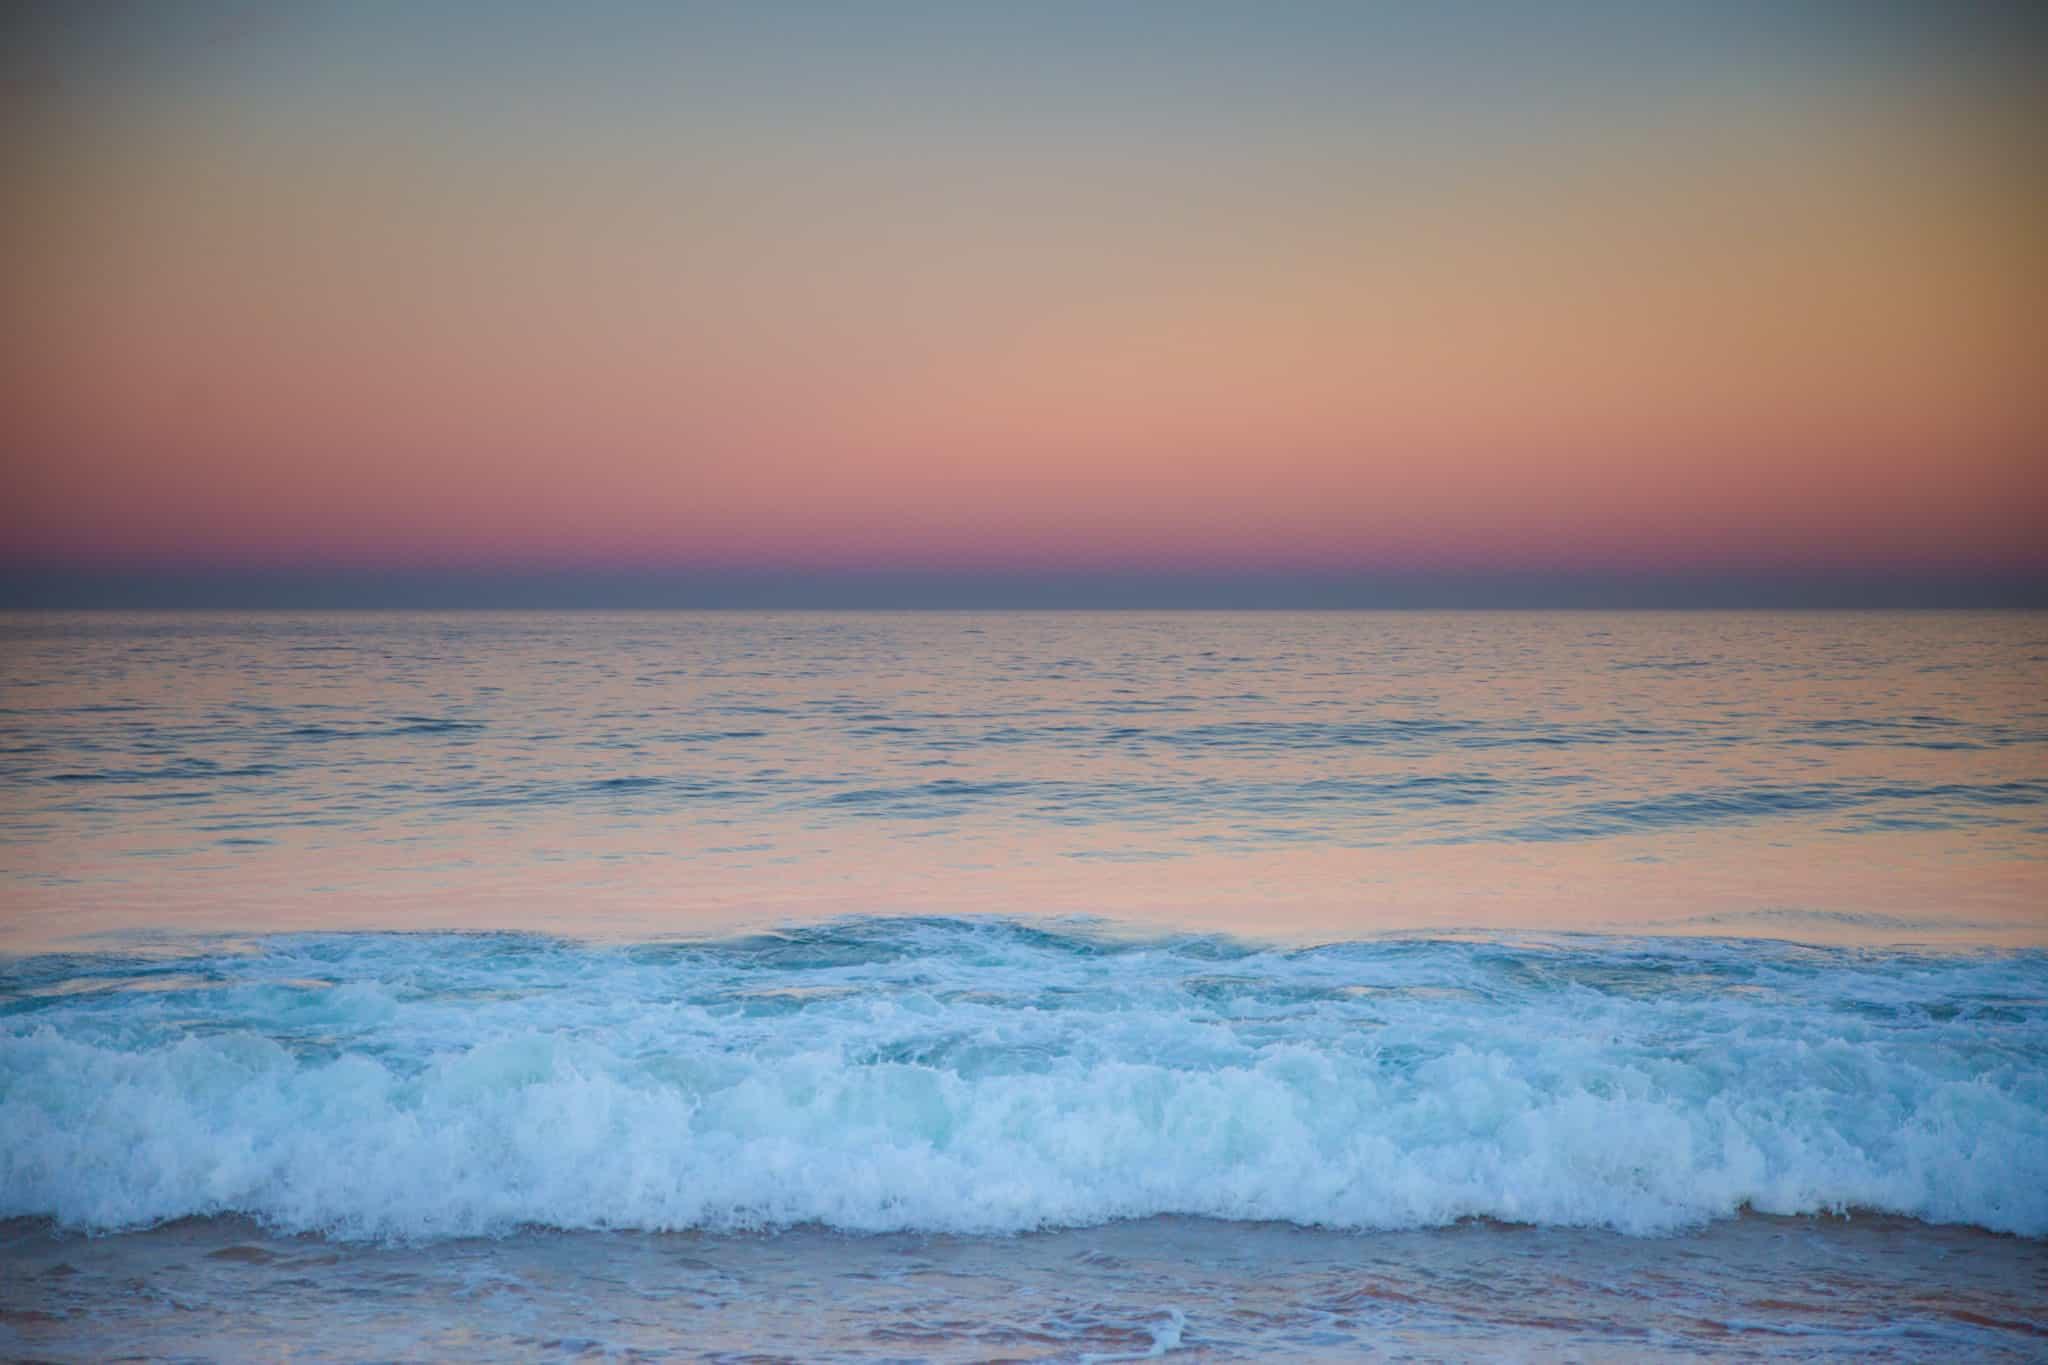 TravelwithMeraki - Wamberal Beach - Wamberal - NSW - Australia